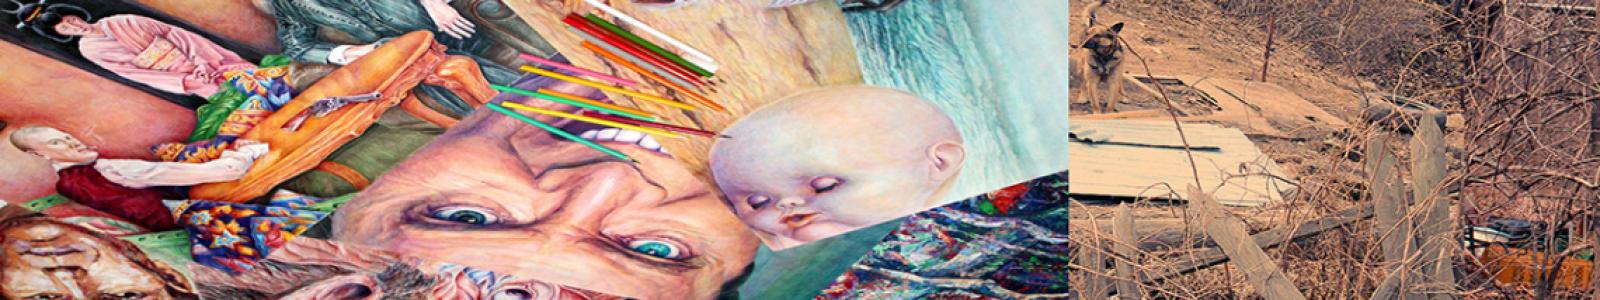 Gallery Painter Igor Komornyy